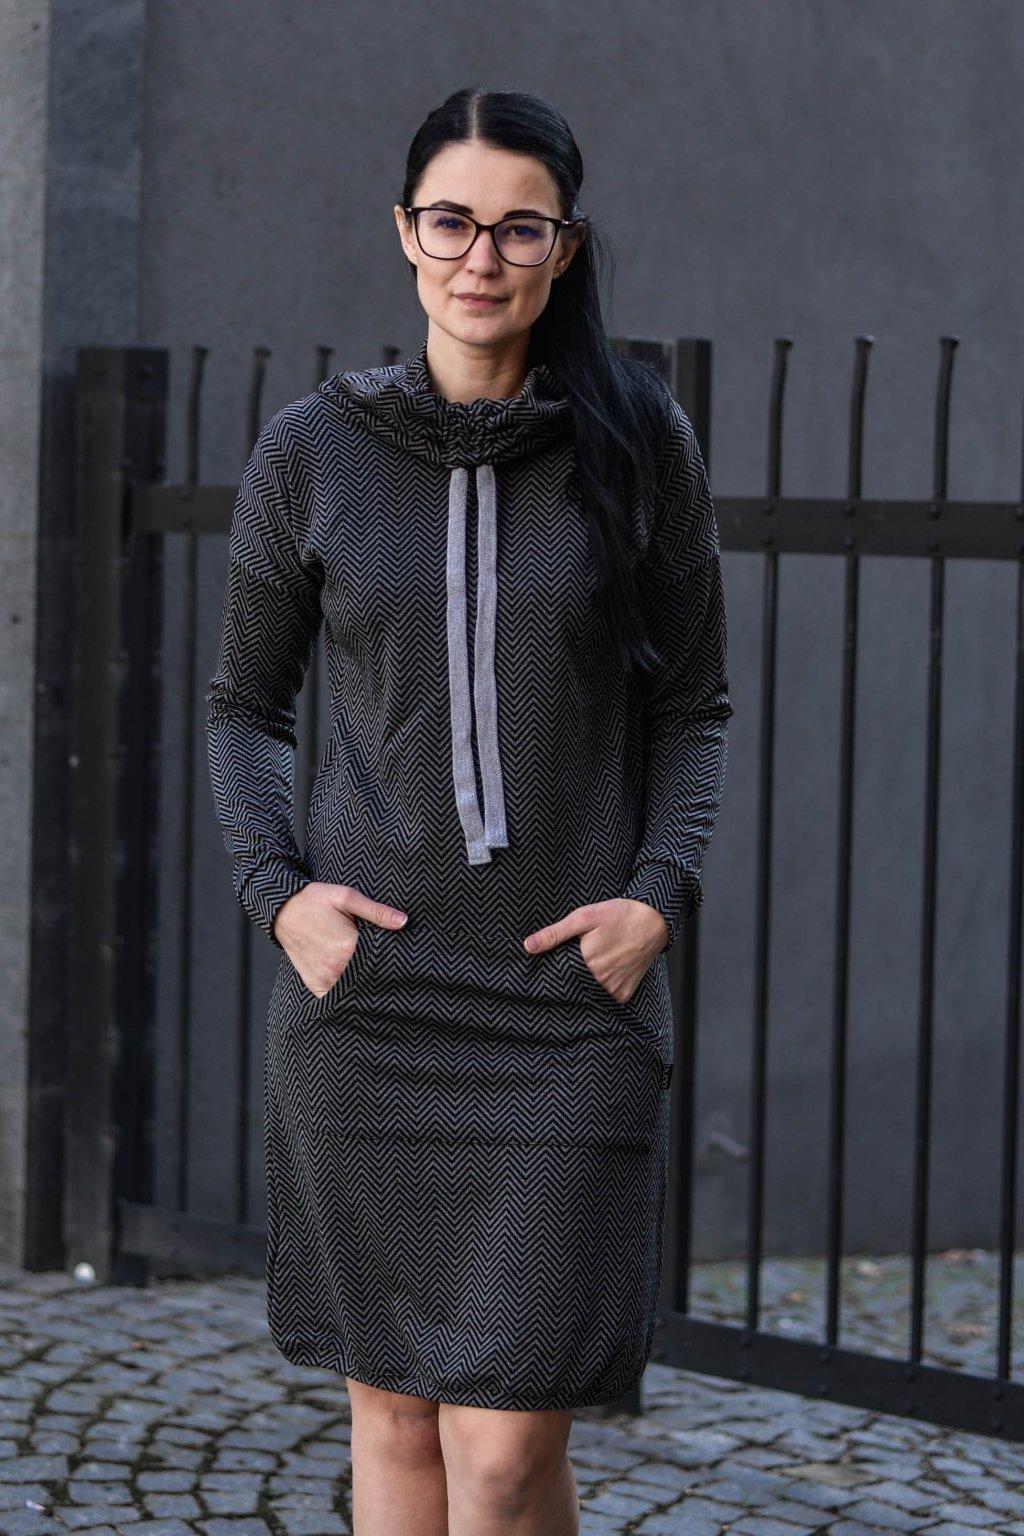 Šaty Thalia Black Chevron